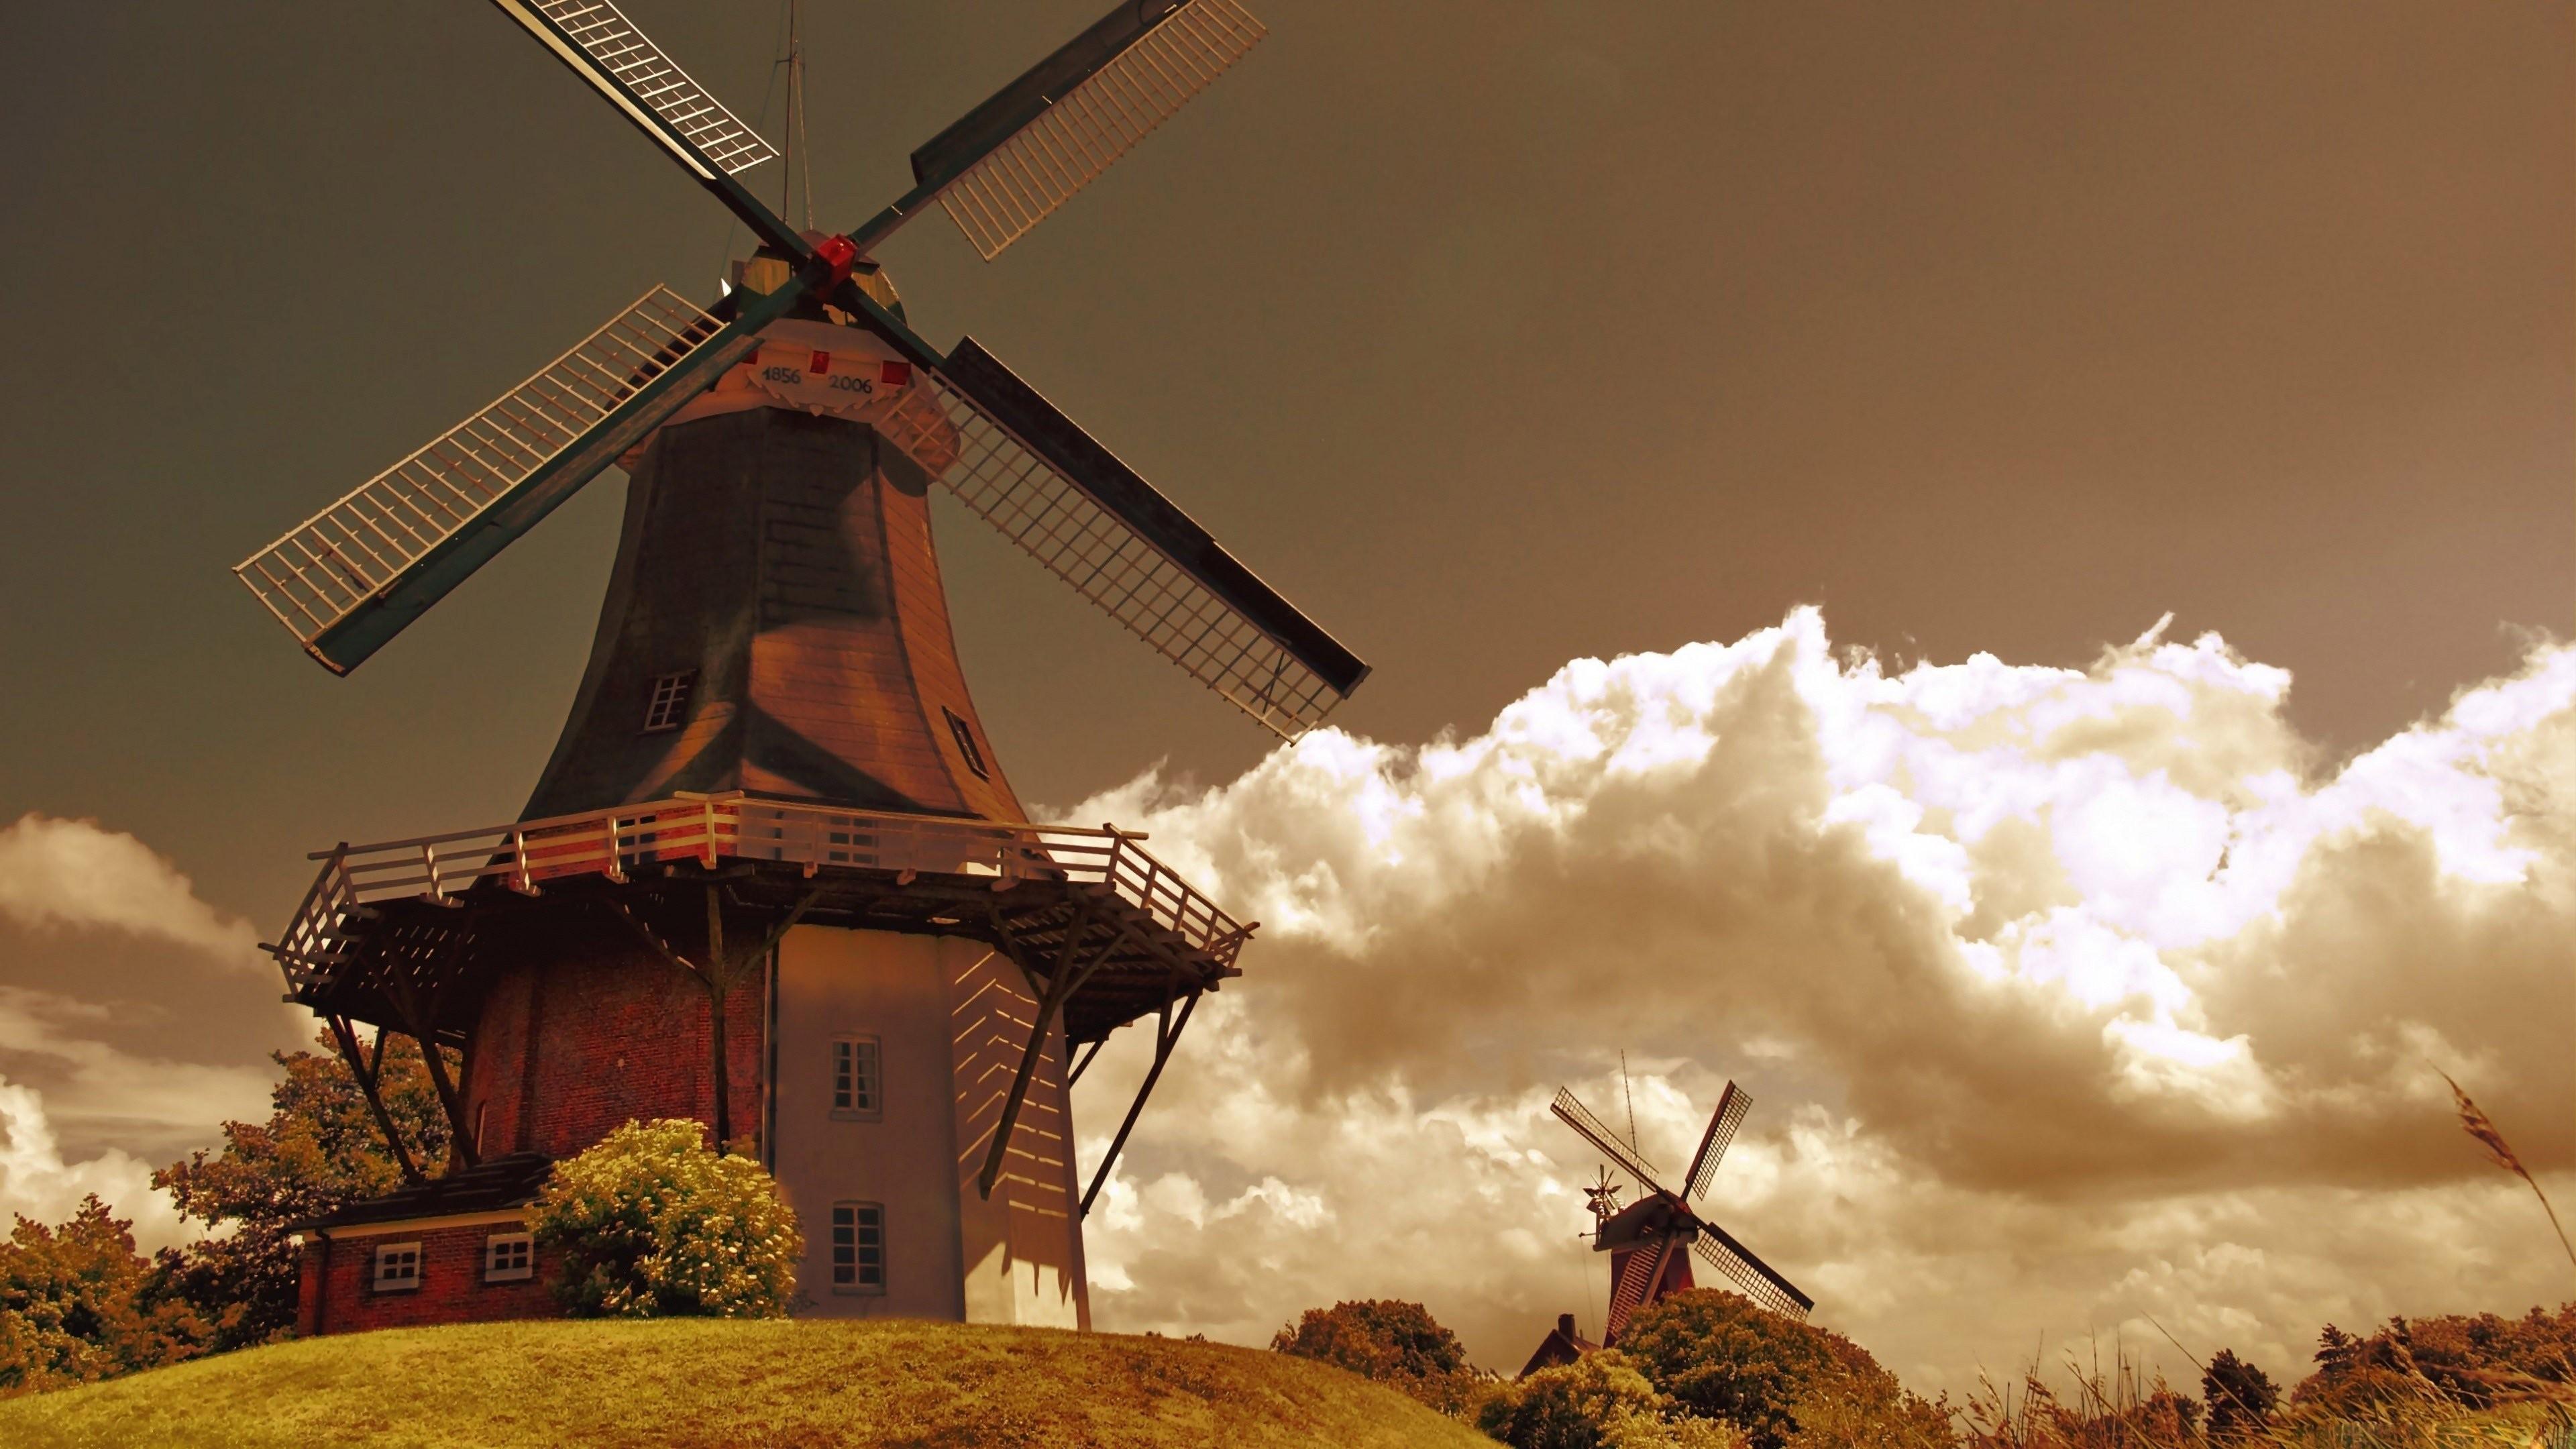 Gorillaz Windmill Wallpaper 71 Images